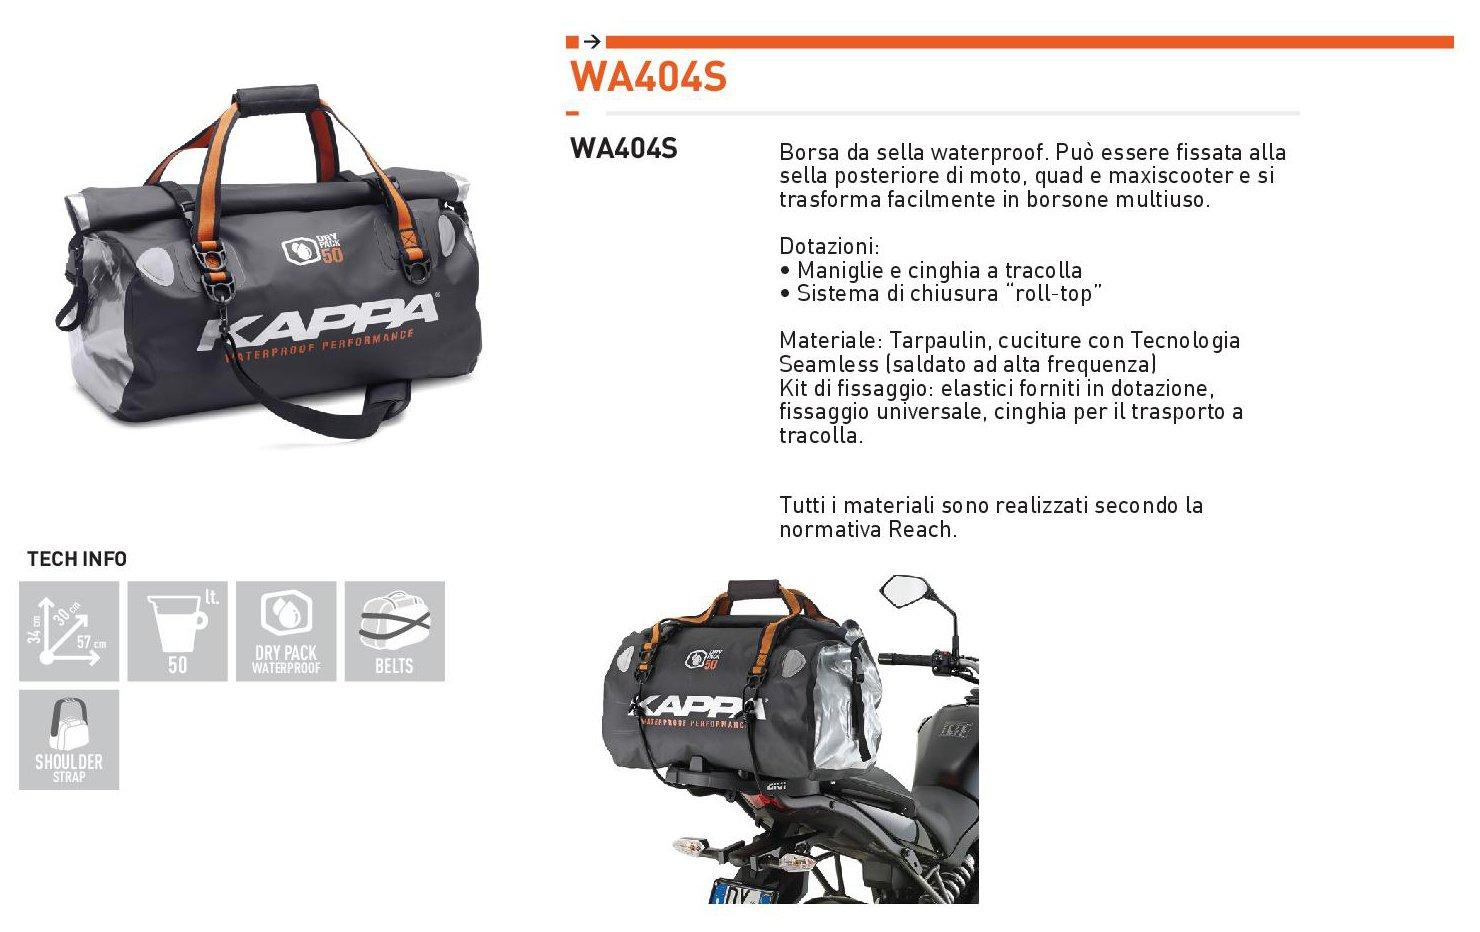 Borsa da sella New waterproof WA404S Kappa Moto 2014  Amazon.co.uk  Car    Motorbike a1835b371a375